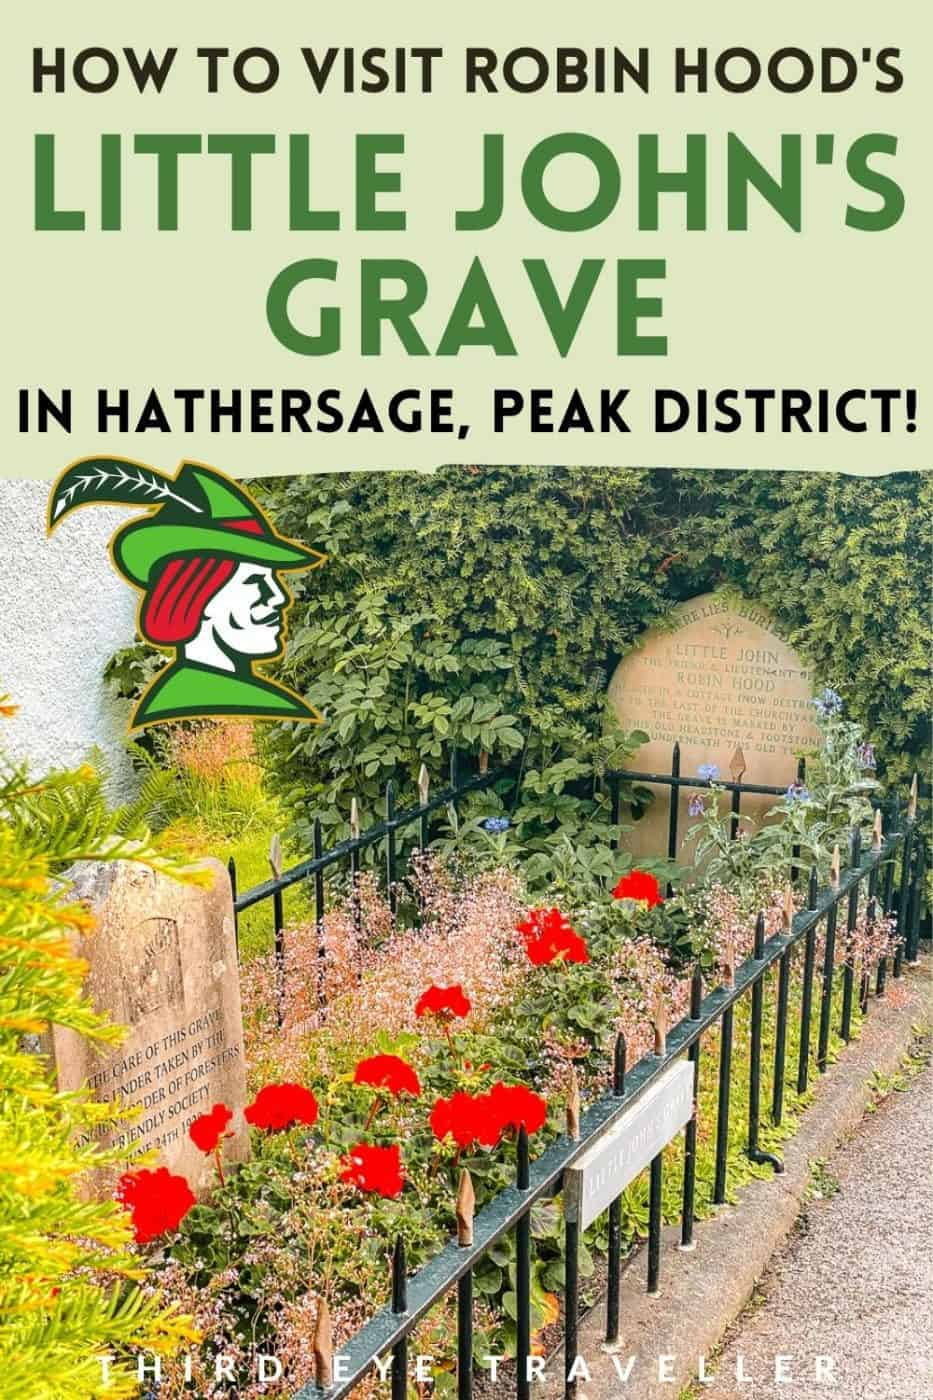 How to find Little John's Grave Hathersage Peak District